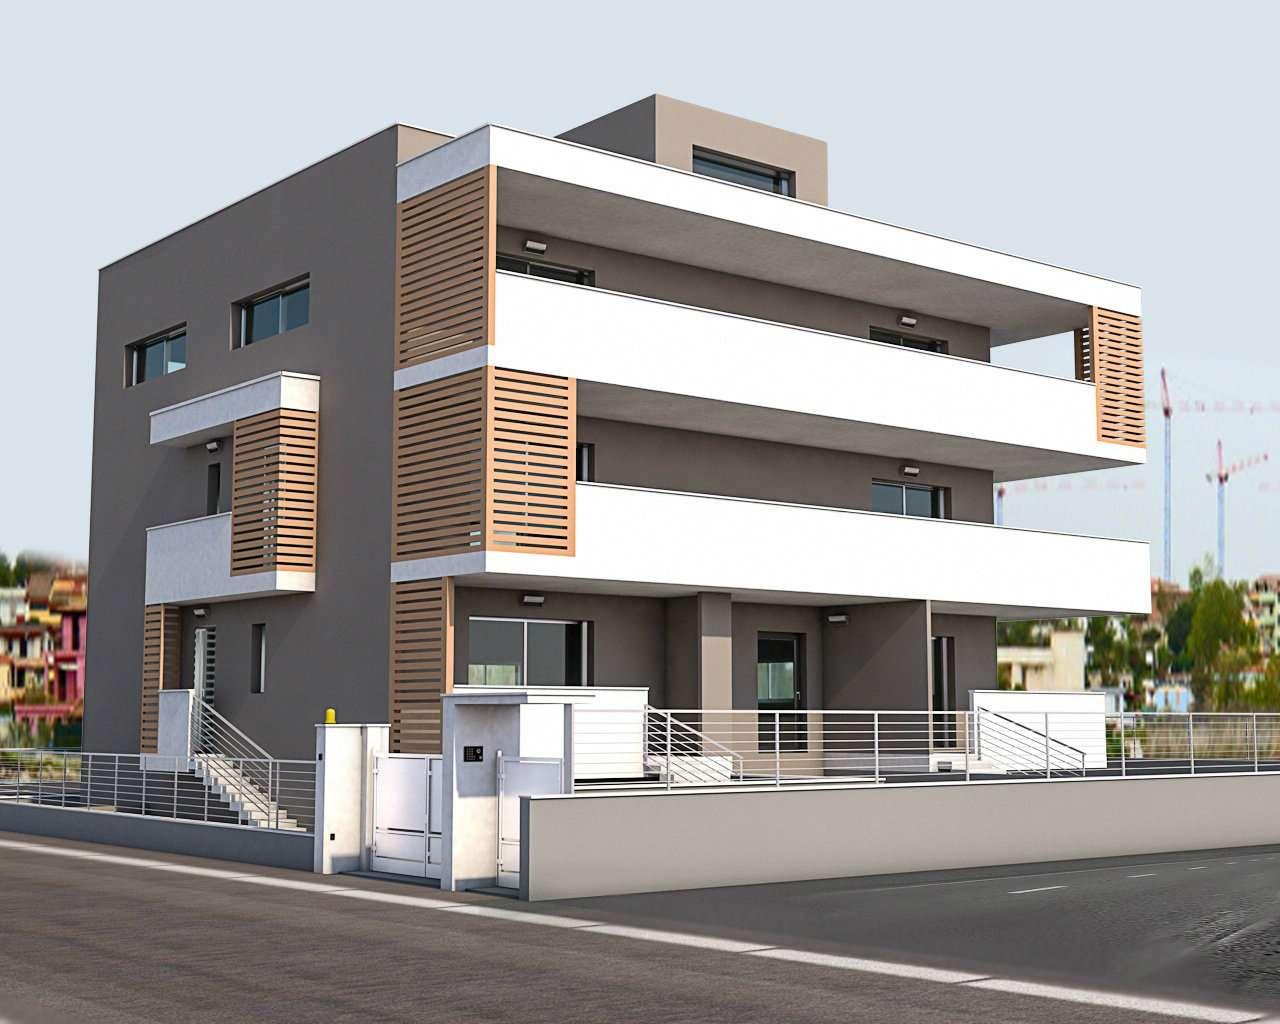 appartamenti trilocali in vendita a giulianova